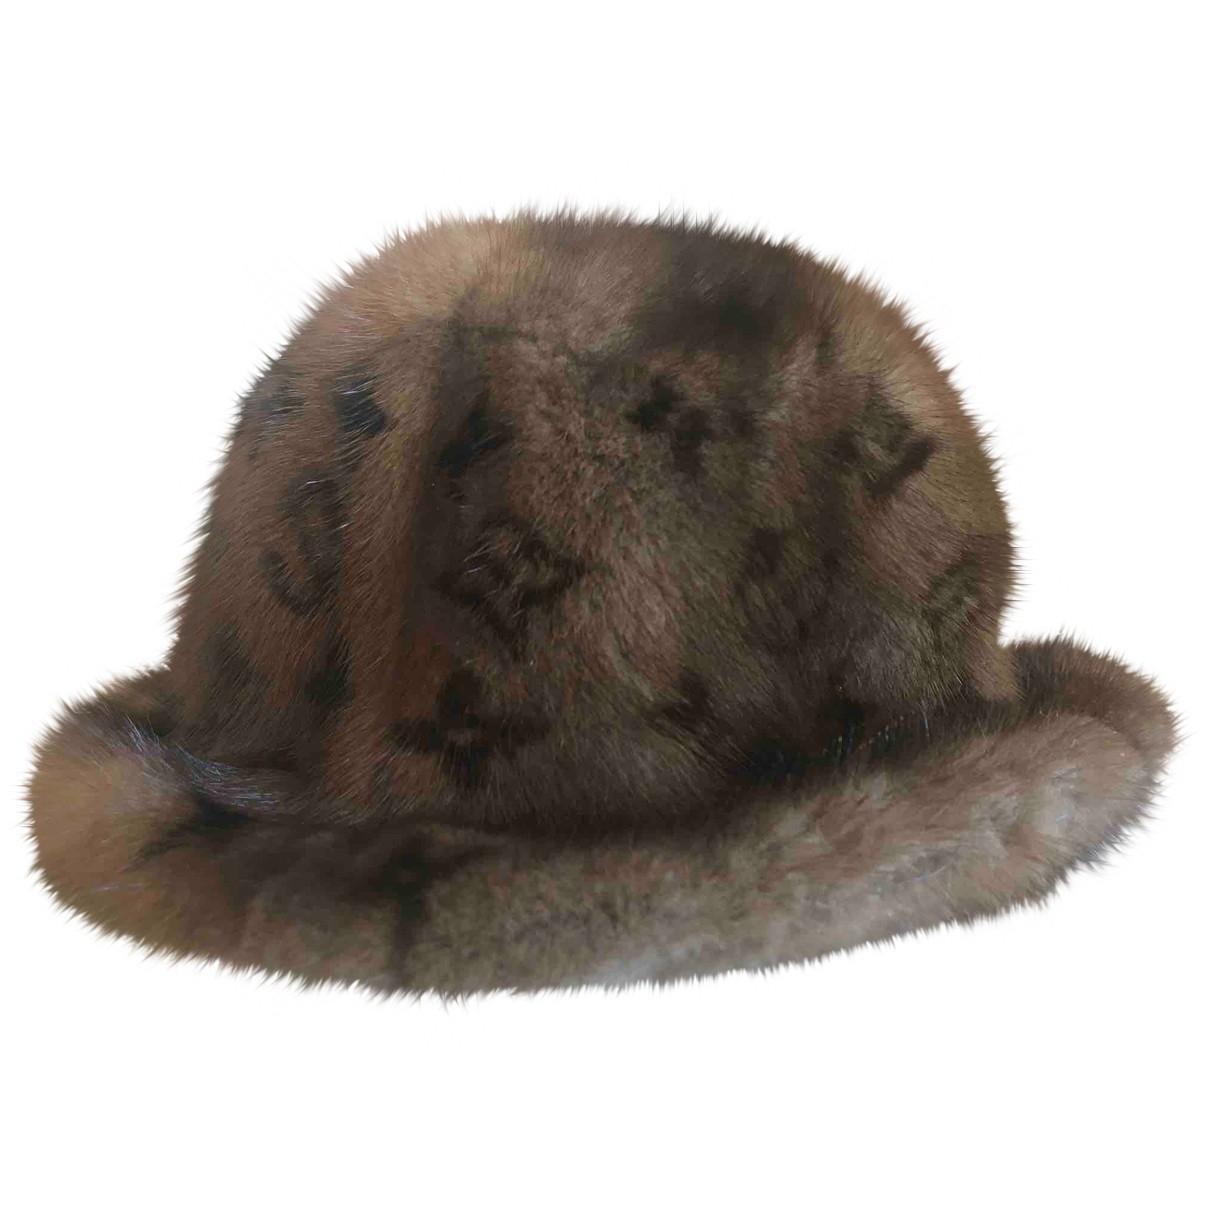 Louis Vuitton \N Brown Mink hat for Women L International